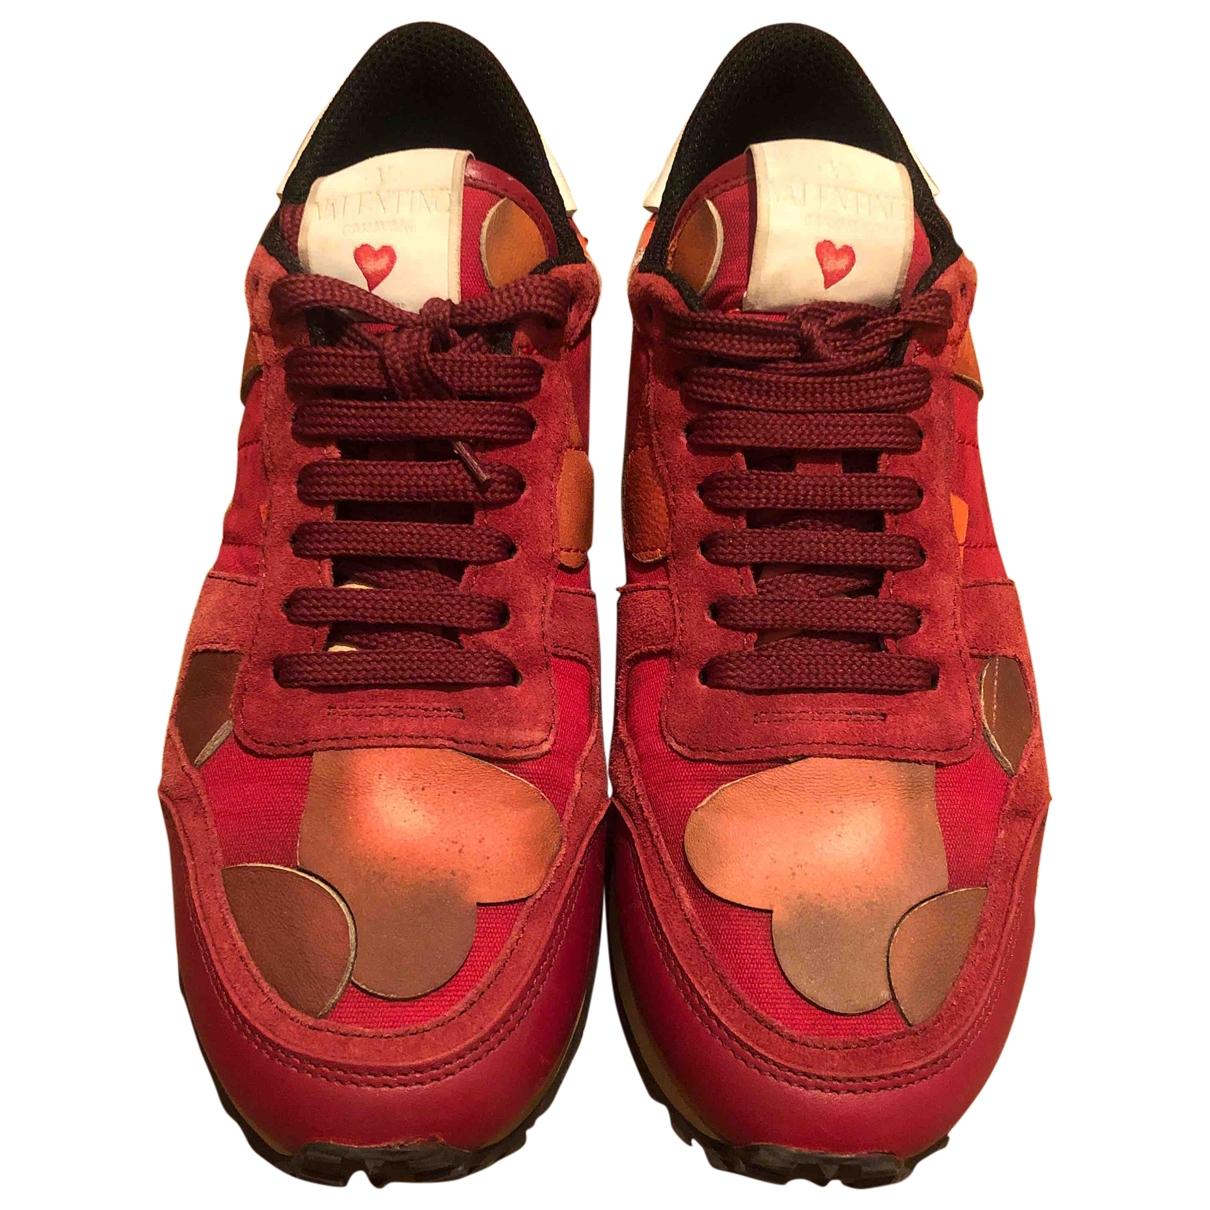 Valentino Garavani Rockrunner Red Leather Trainers for Women 38 EU